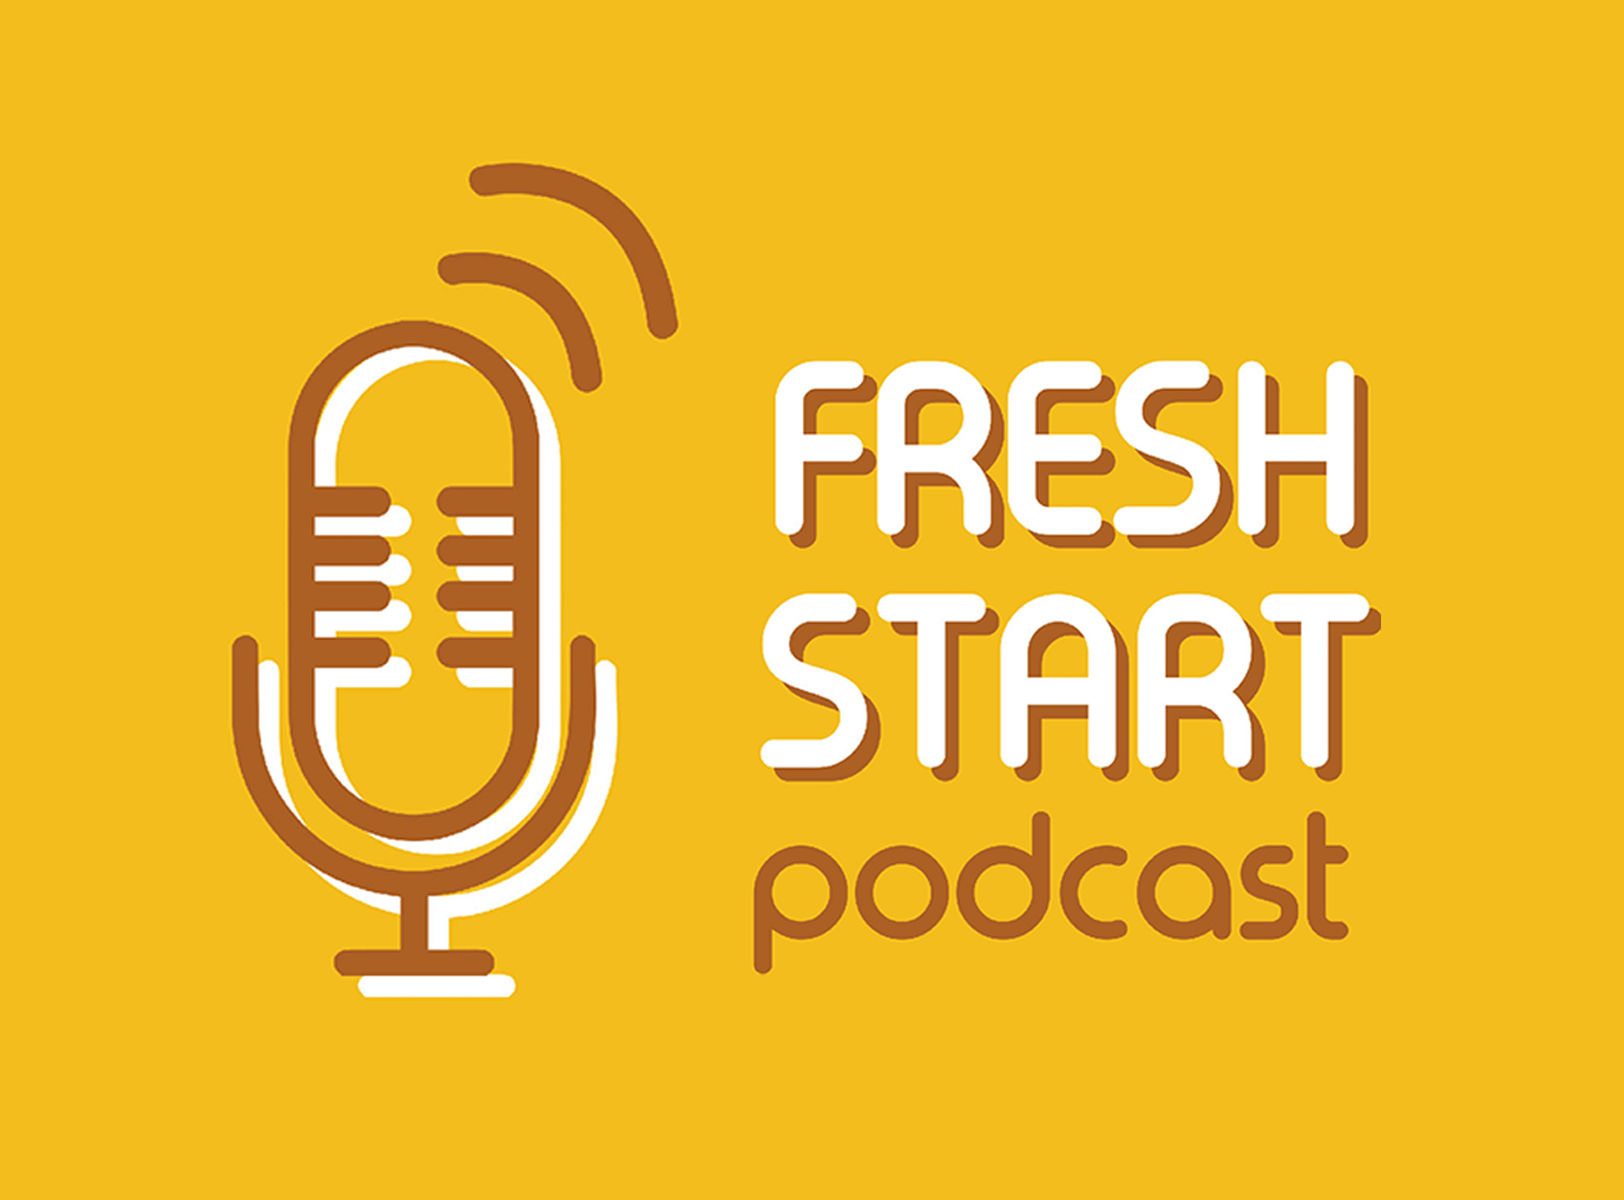 Fresh Start: Podcast News (7/28/2019 Sun.)